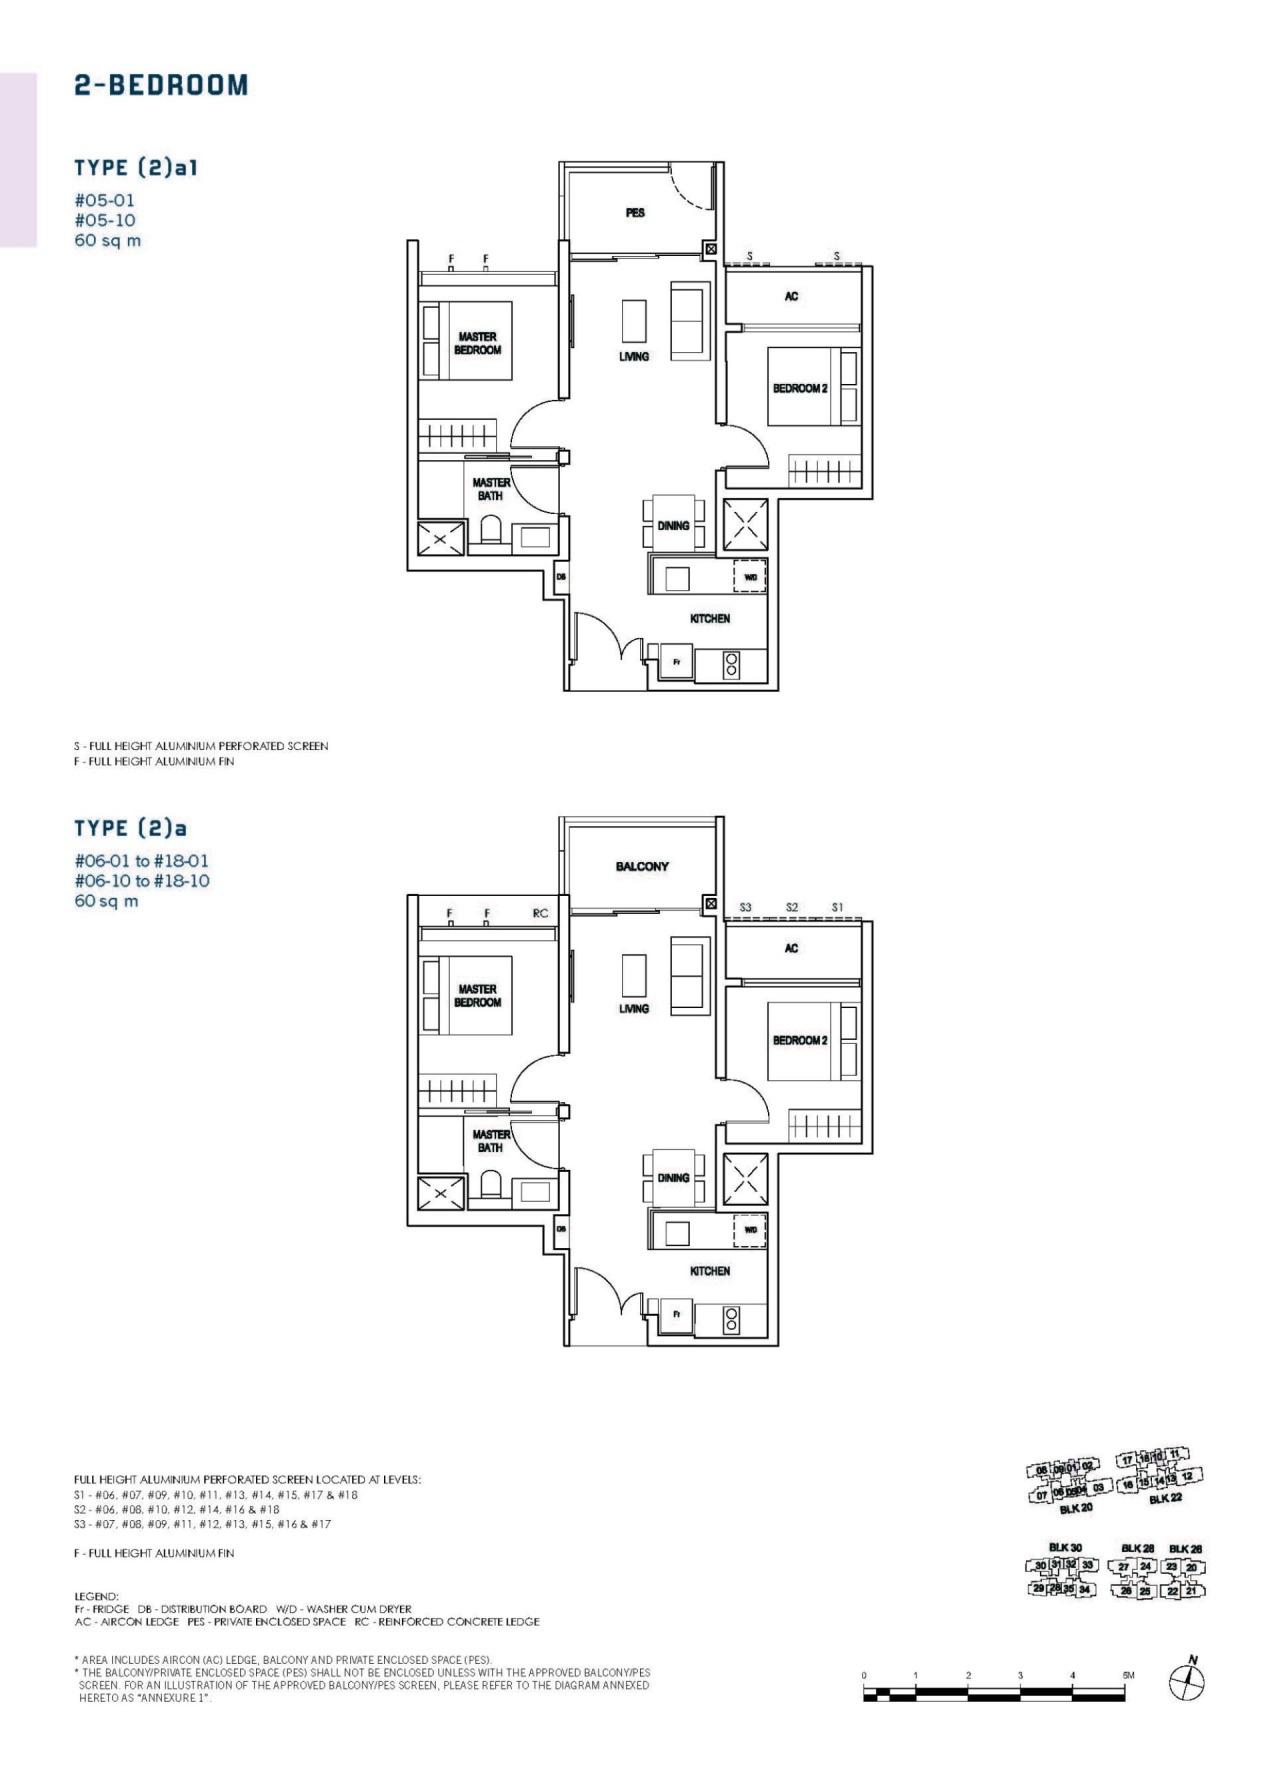 Penrose Floorplan